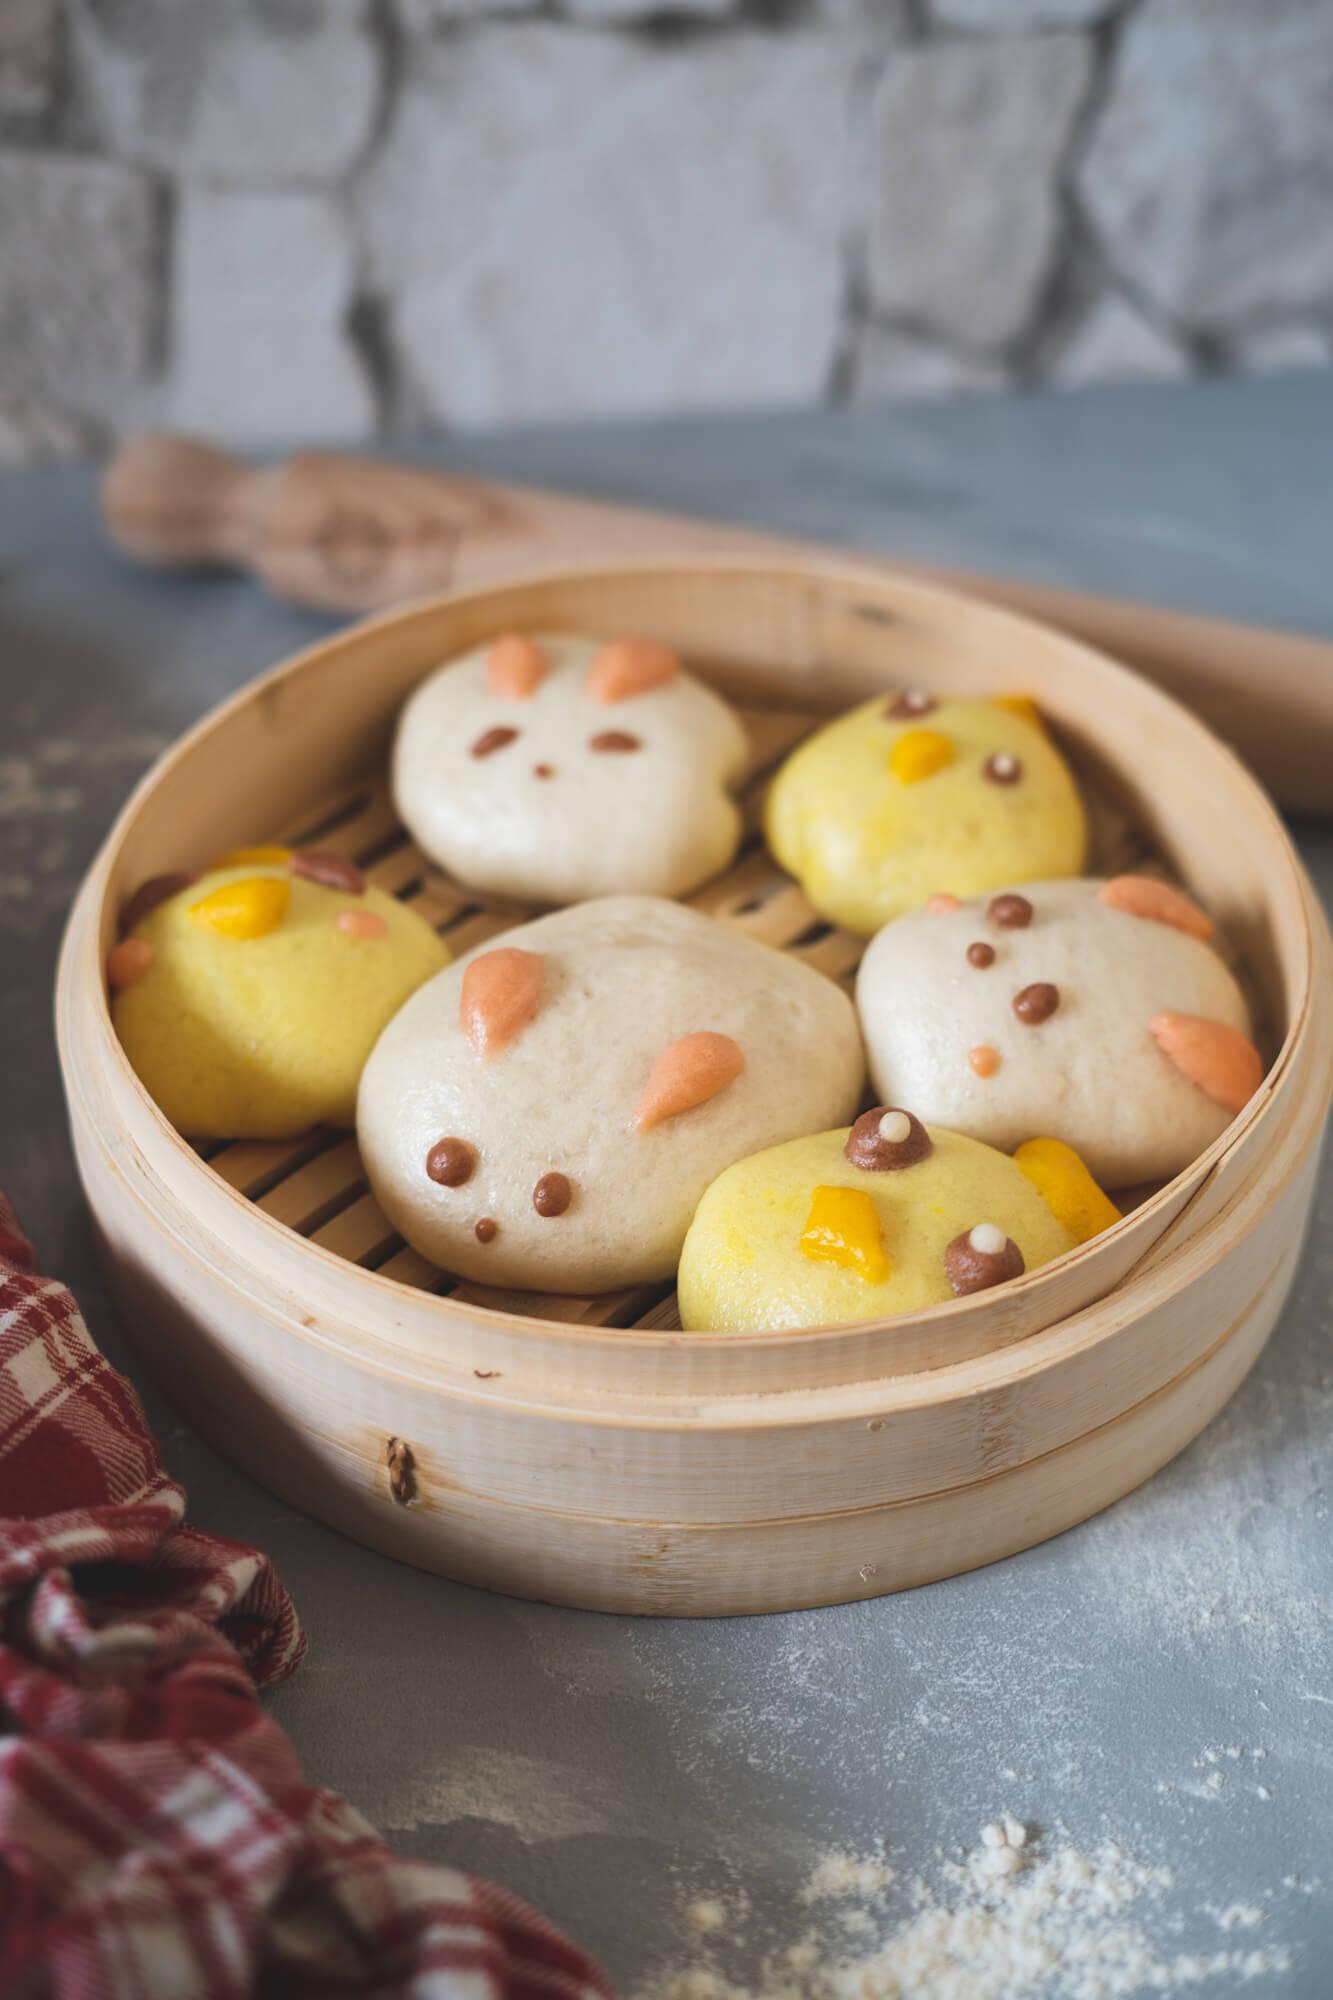 Easter Nai Wong Bao: Bunnies, Chicks and an Emoji-nal Breakdown